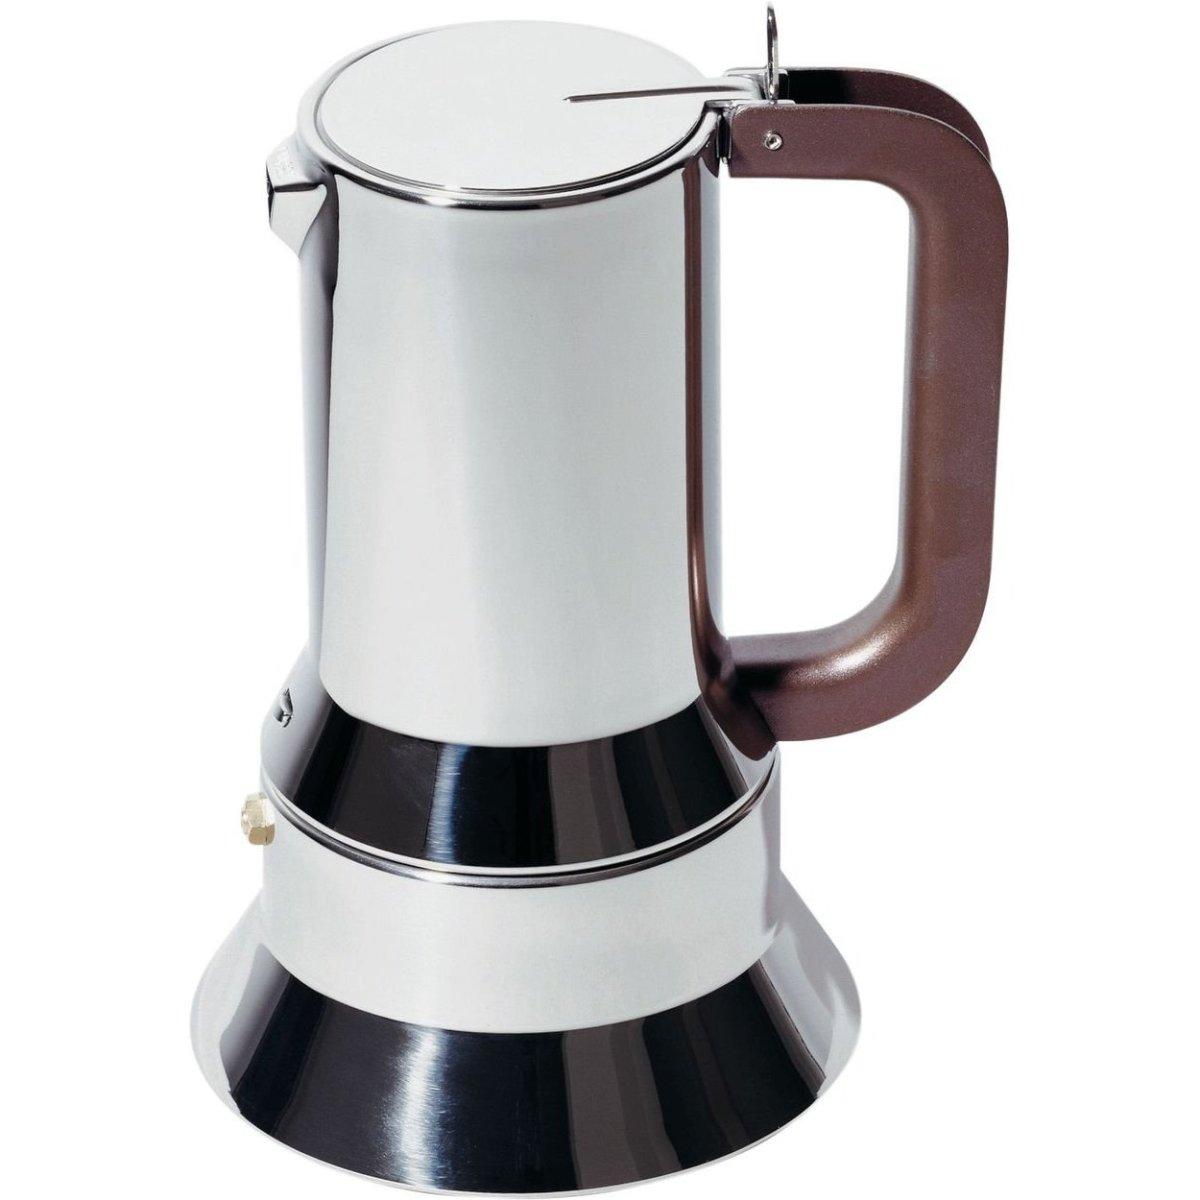 5 Best Stovetop Espresso Makers 2016